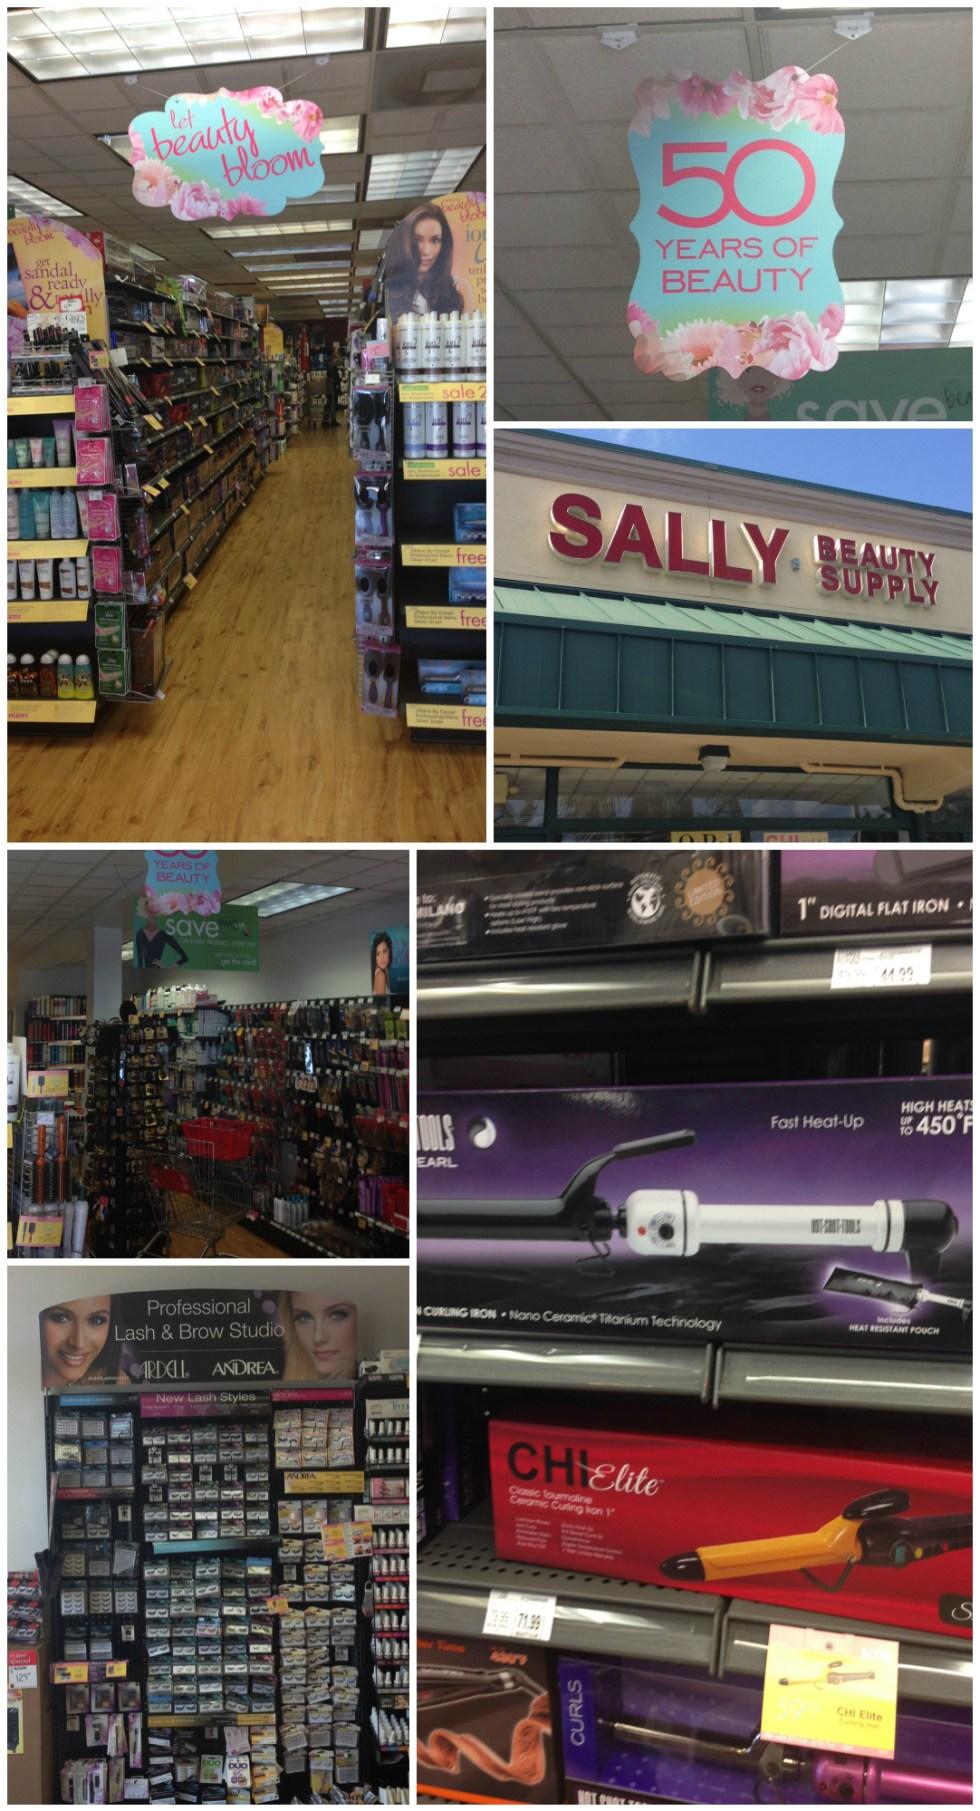 Sallys Beauty Supply